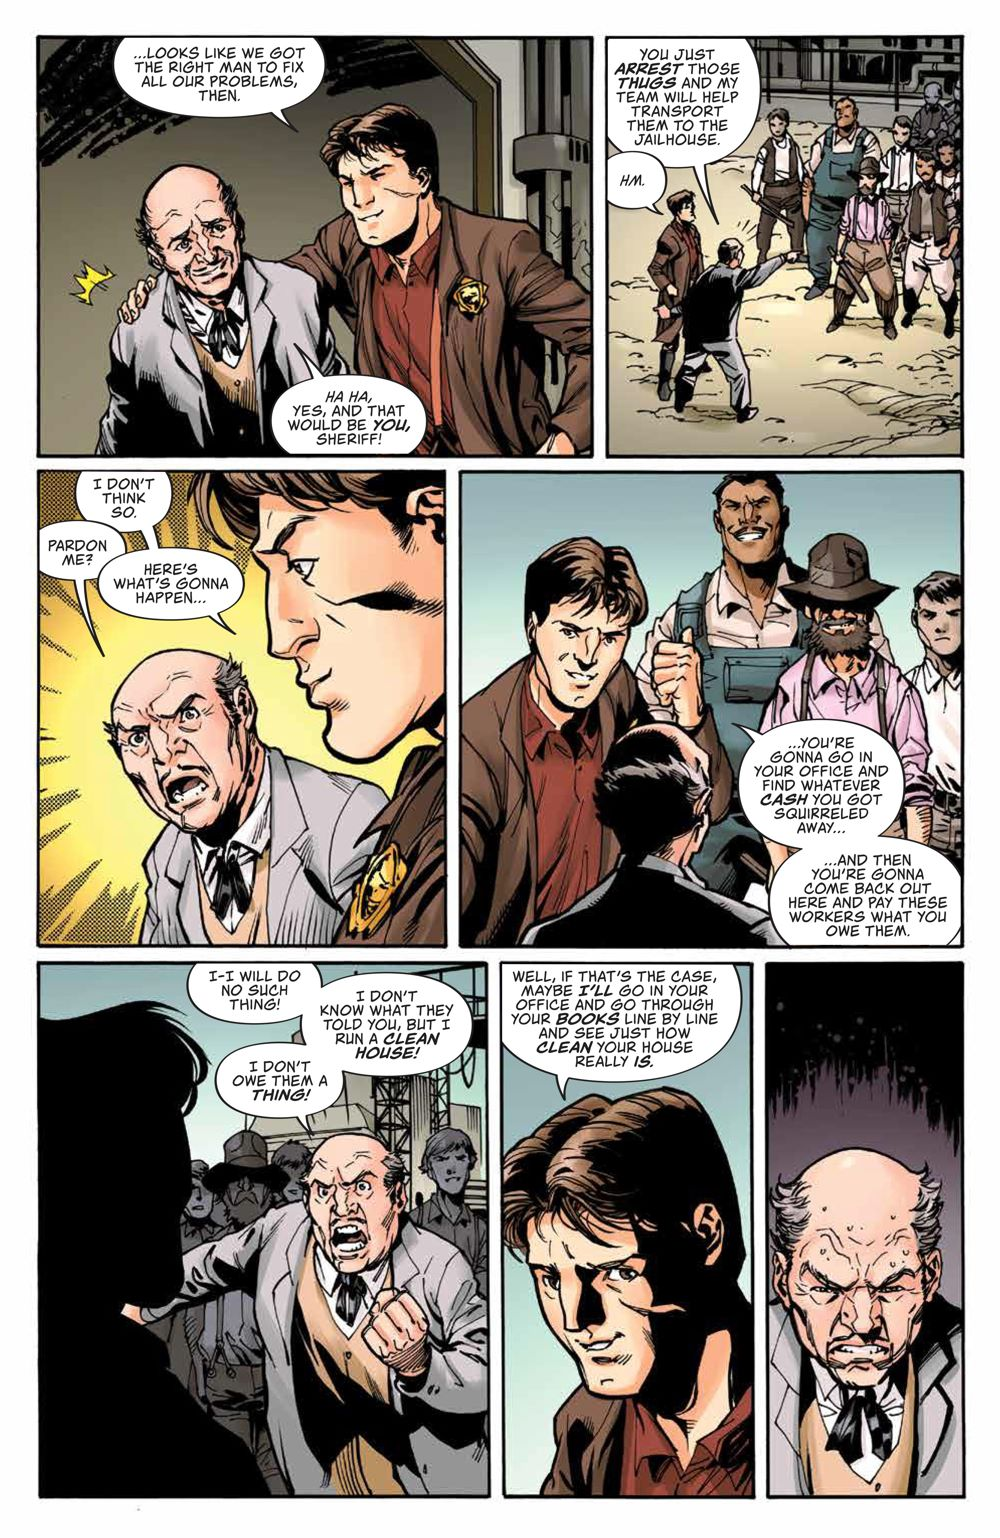 Firefly_NewSheriffVerse_v2_HC_PRESS_18 ComicList Previews: FIREFLY NEW SHERIFF IN THE 'VERSE VOLUME 2 HC